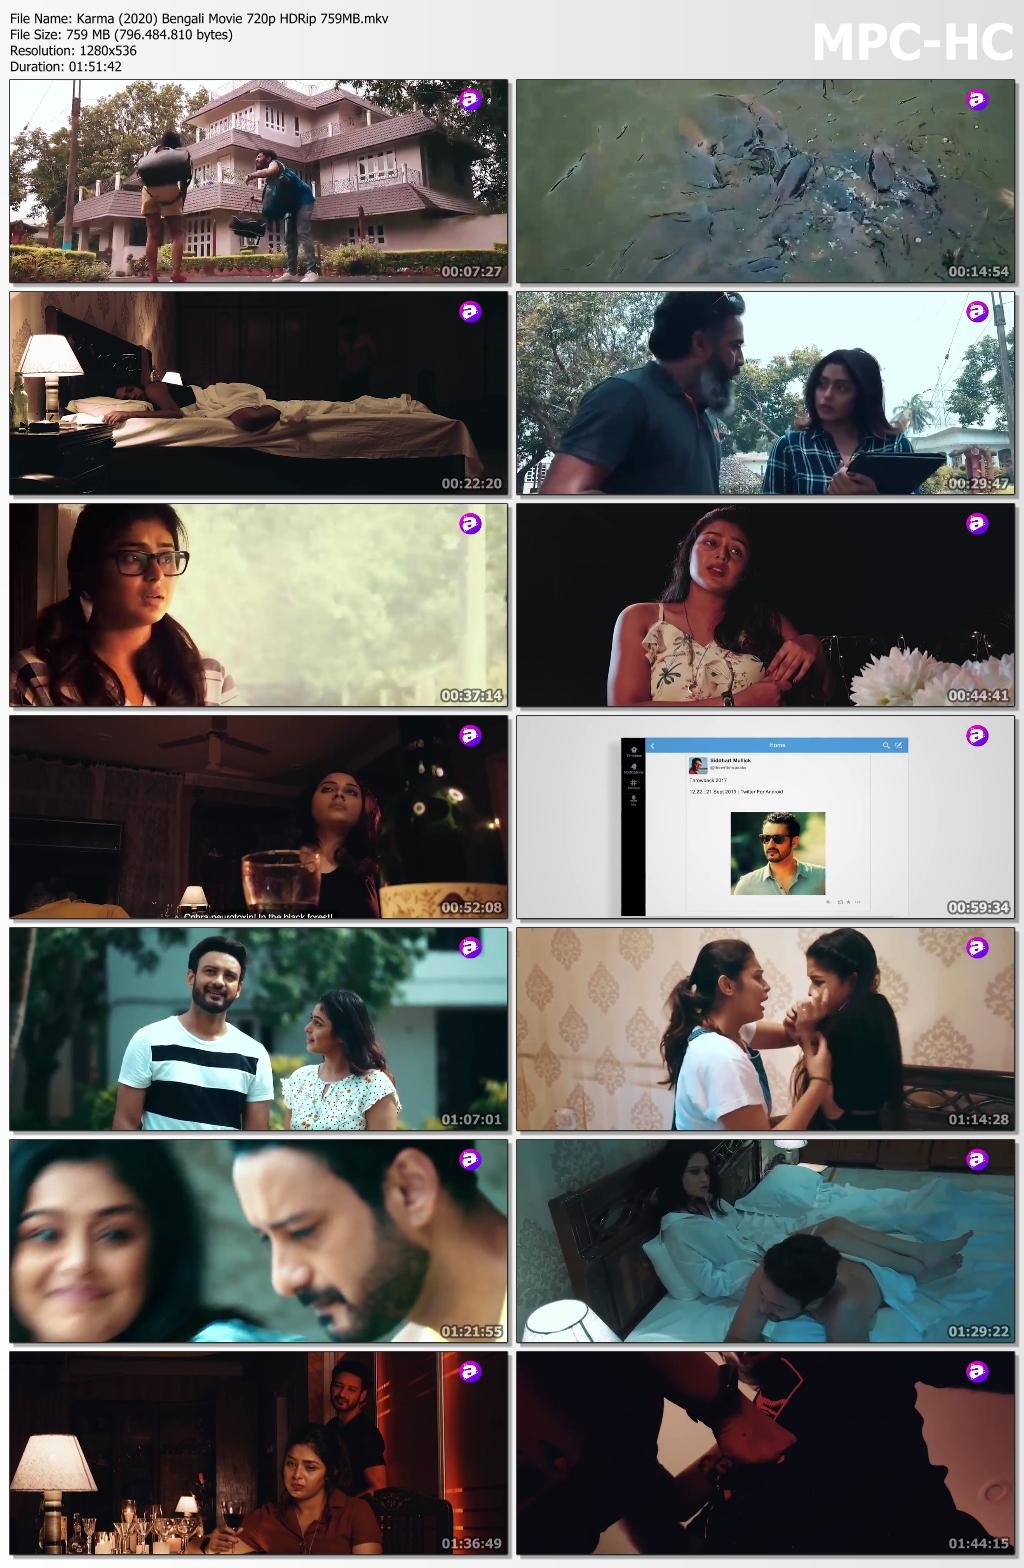 Karma-2020-Bengali-Movie-720p-HDRip-759-MB-mkv-thumbs